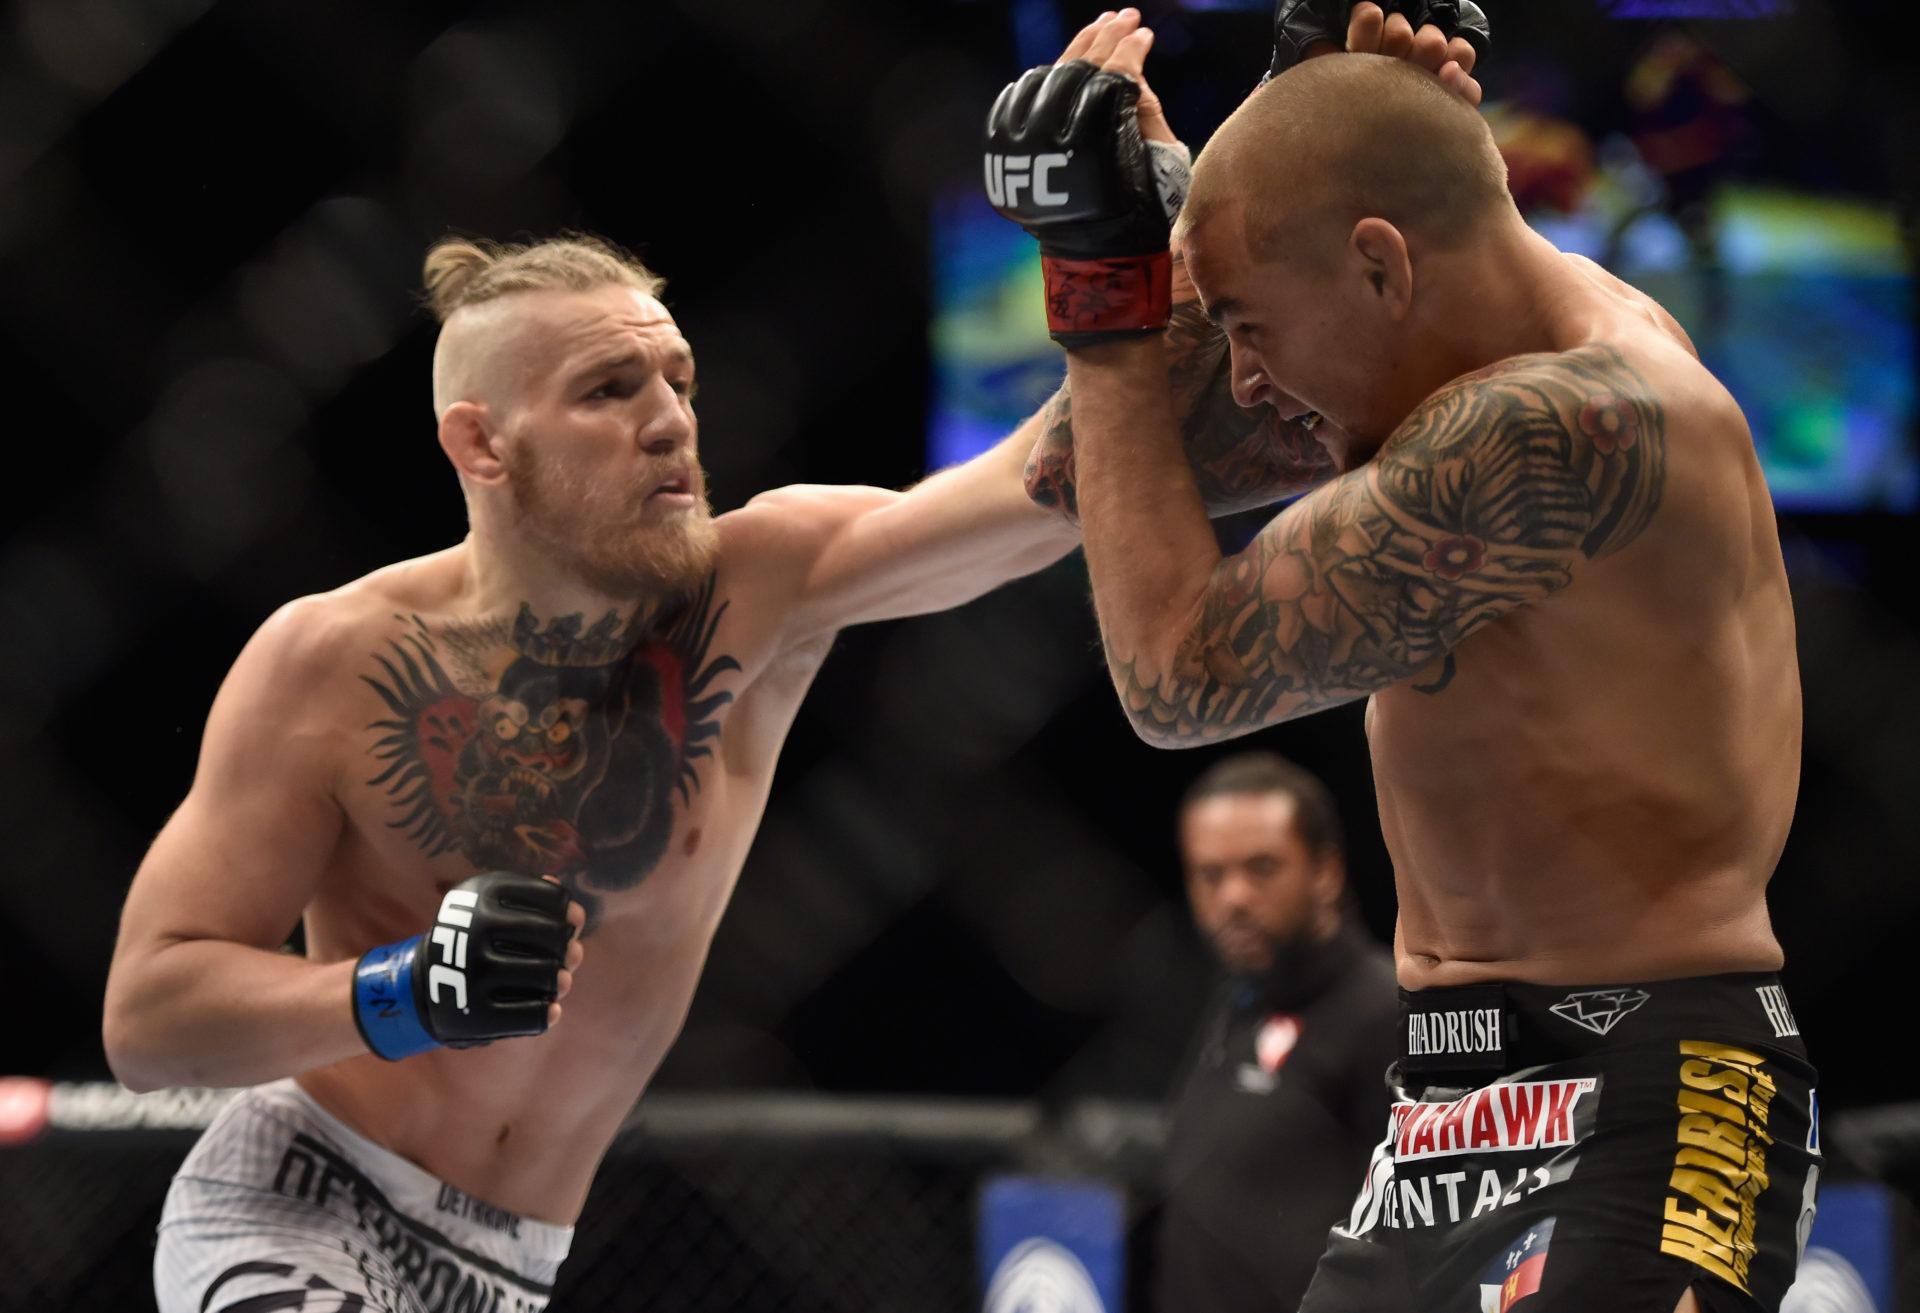 Preview: McGregor/Poirier fight won't go the distance